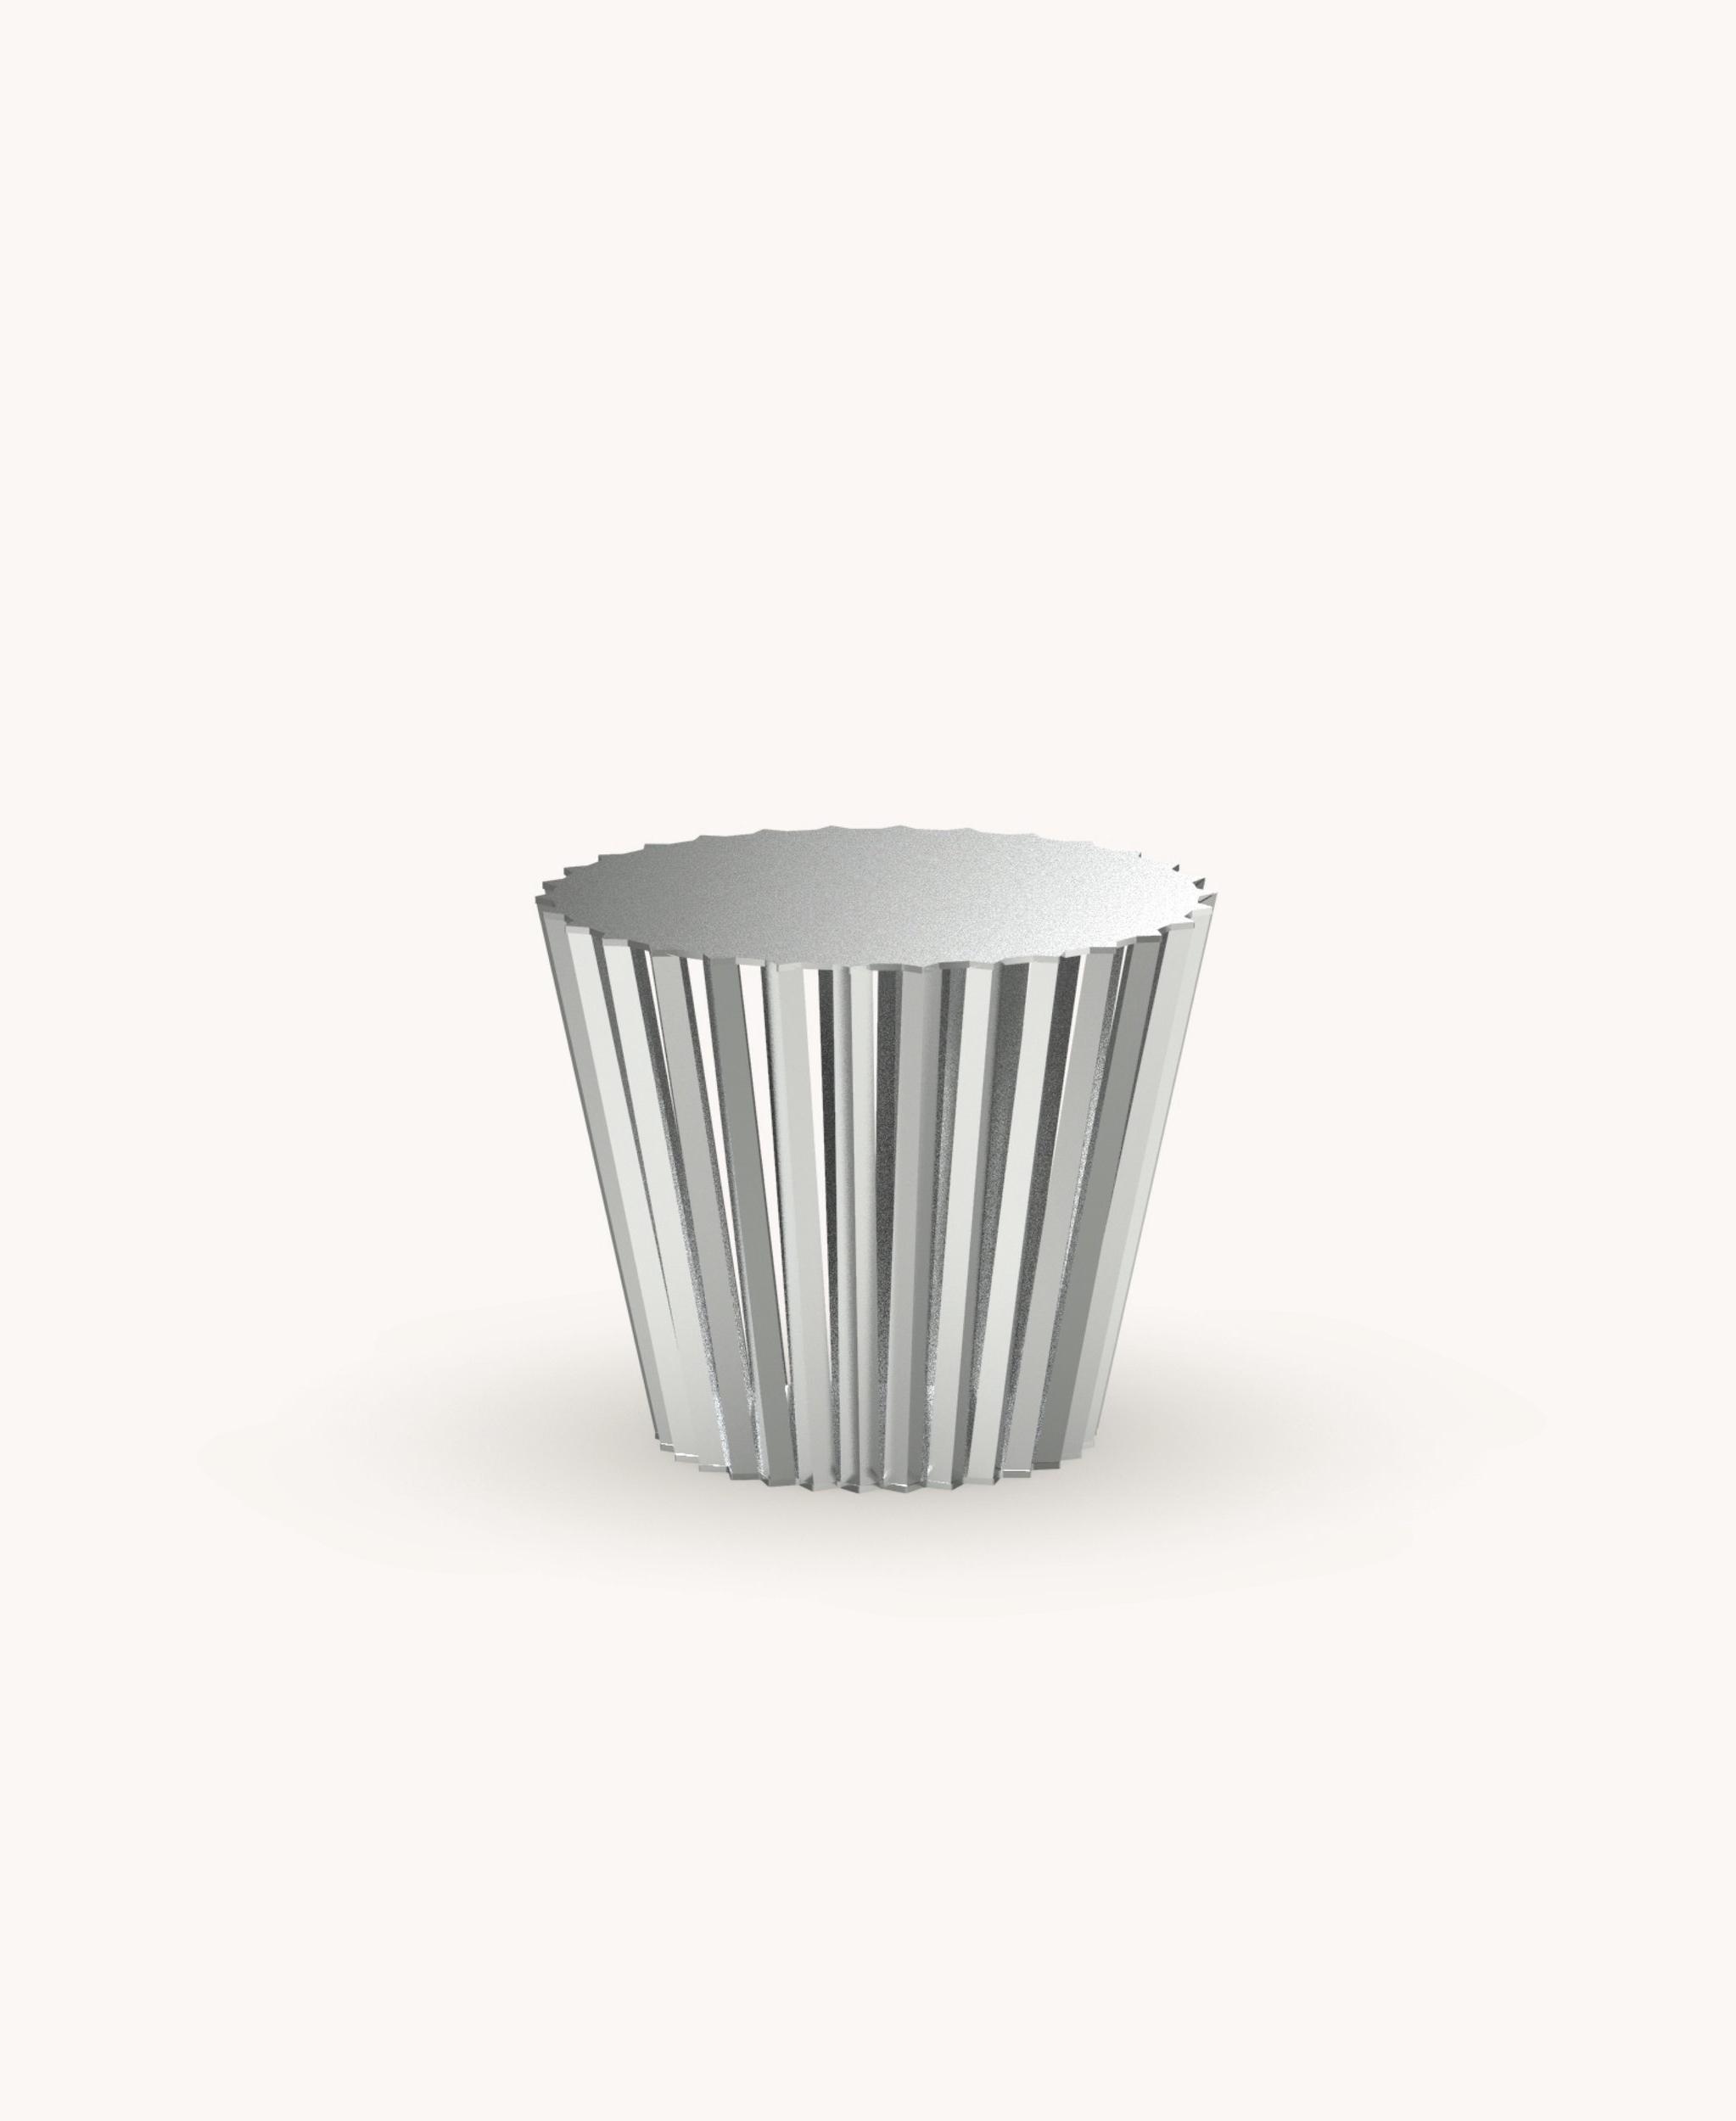 COFFEE TABLE. MACARON - DKK 15.900 · EUR 2130